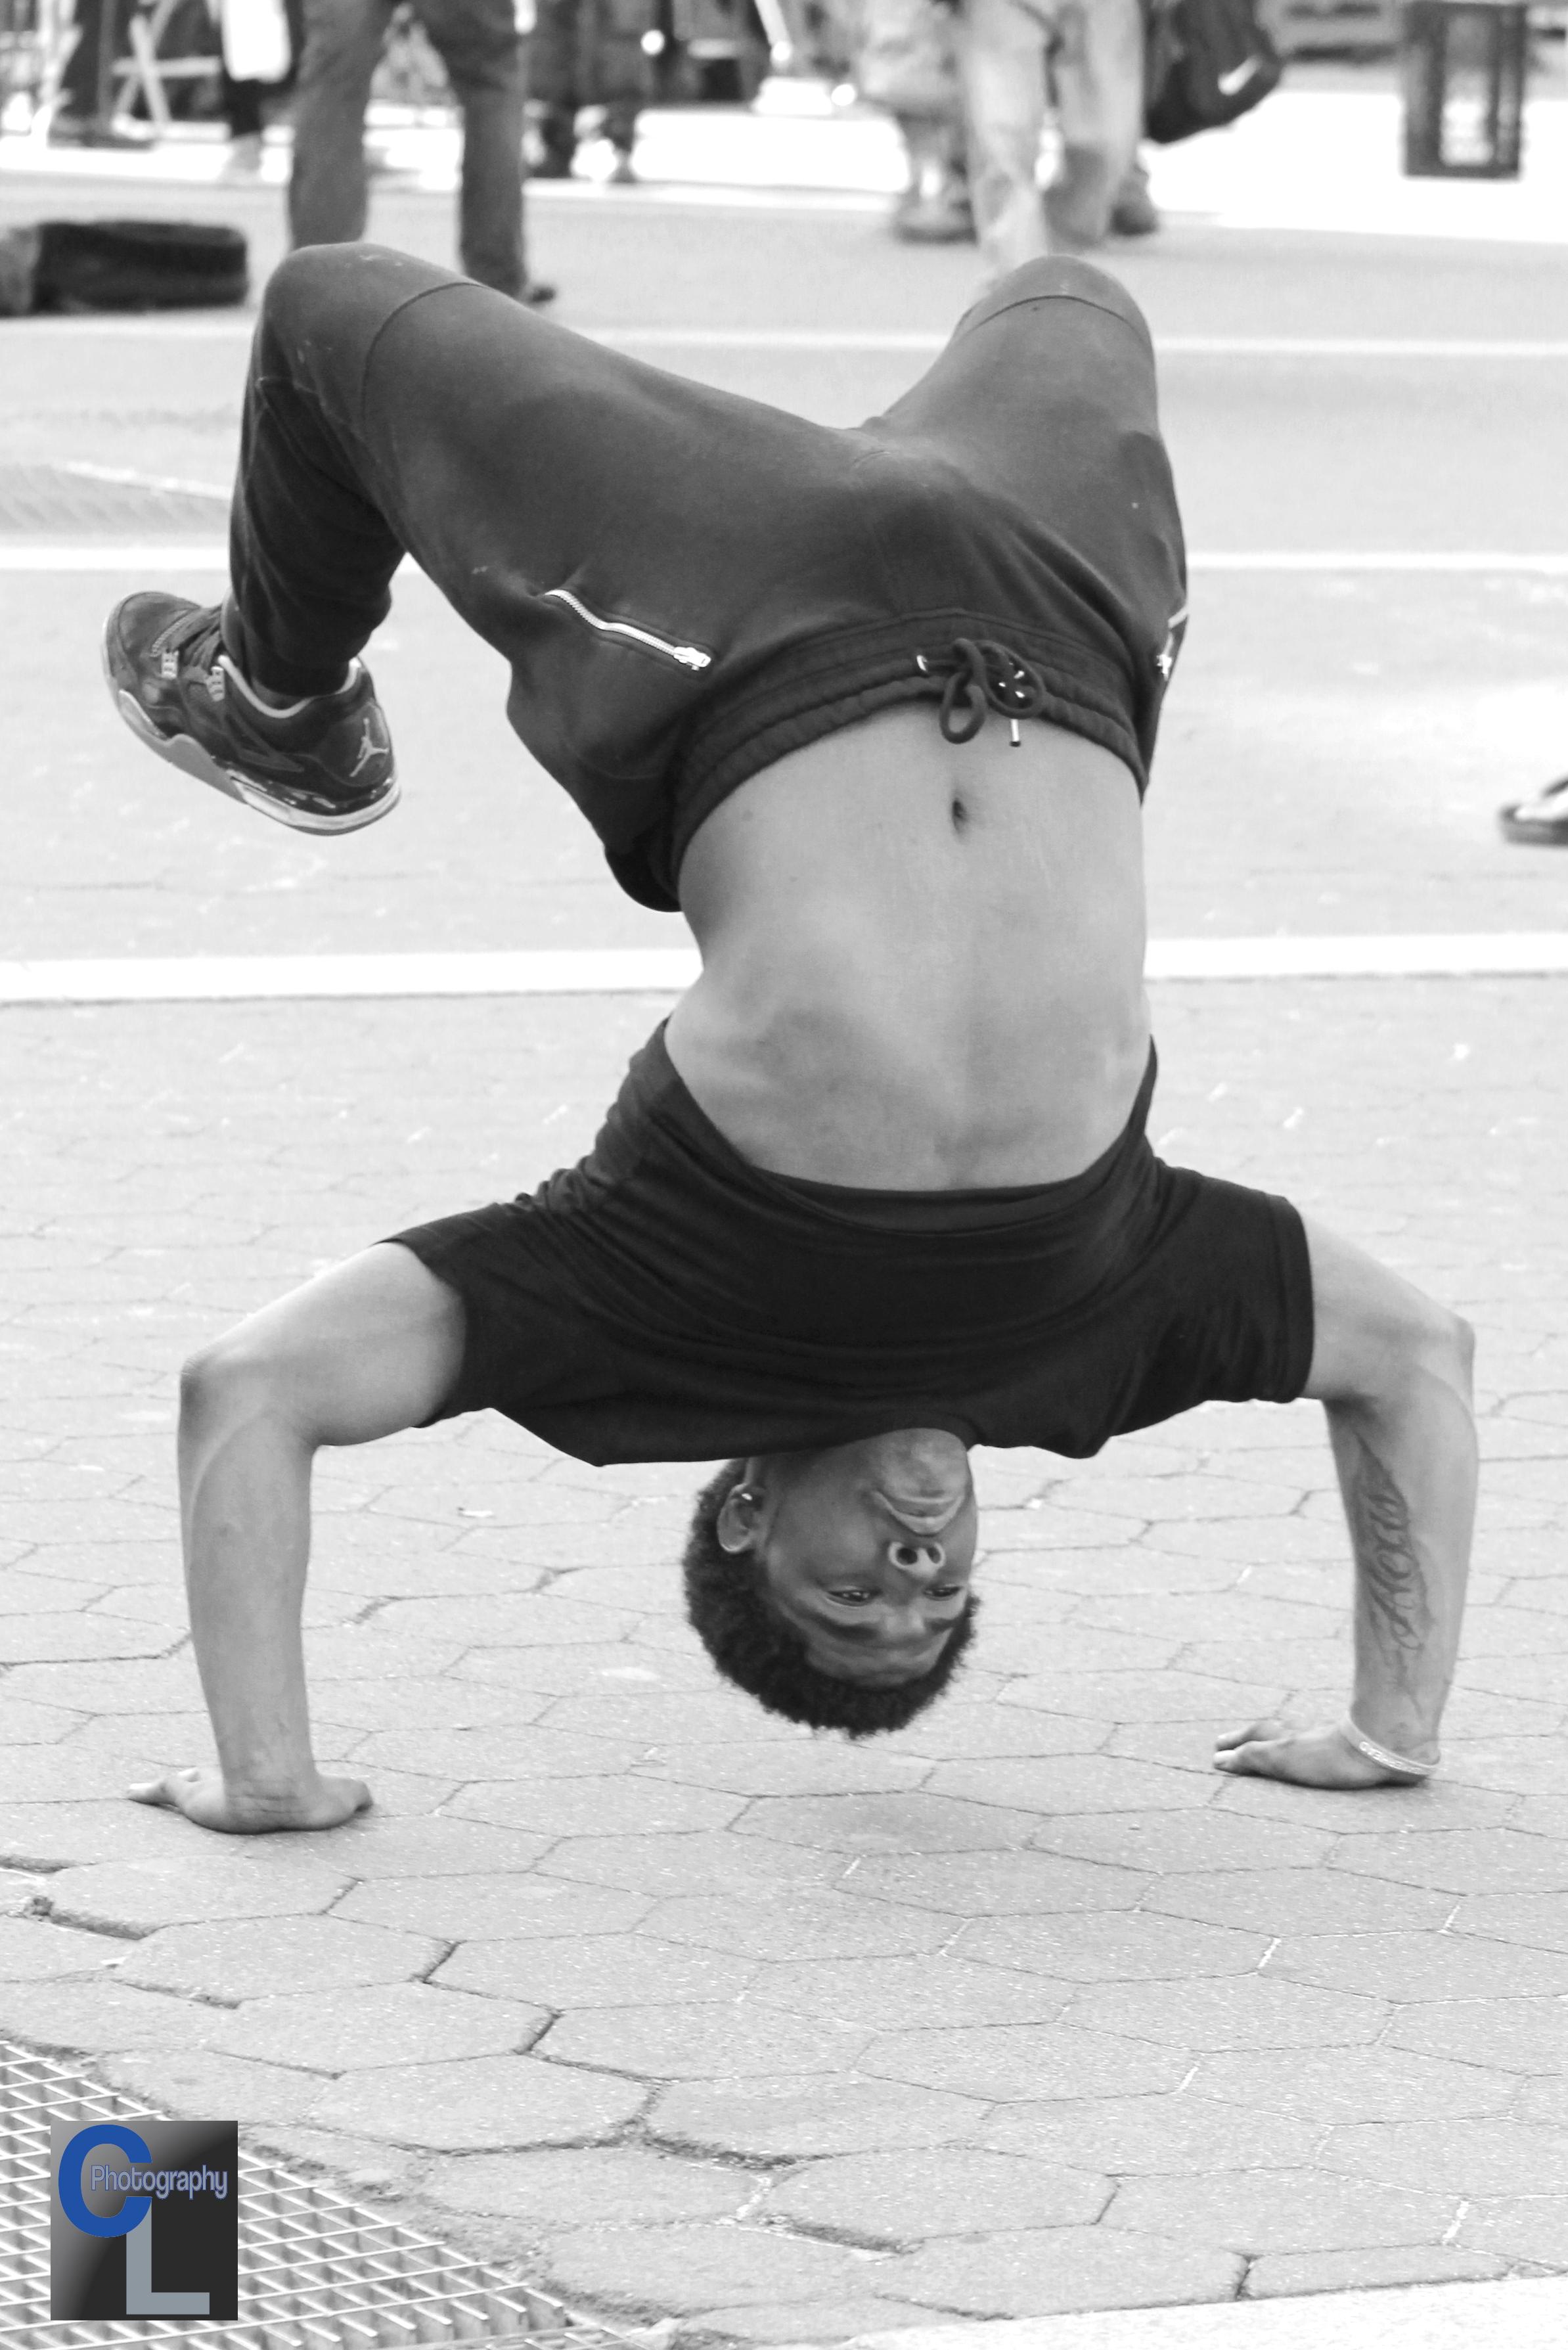 IMG_7870 dancer U sqrclp.JPG